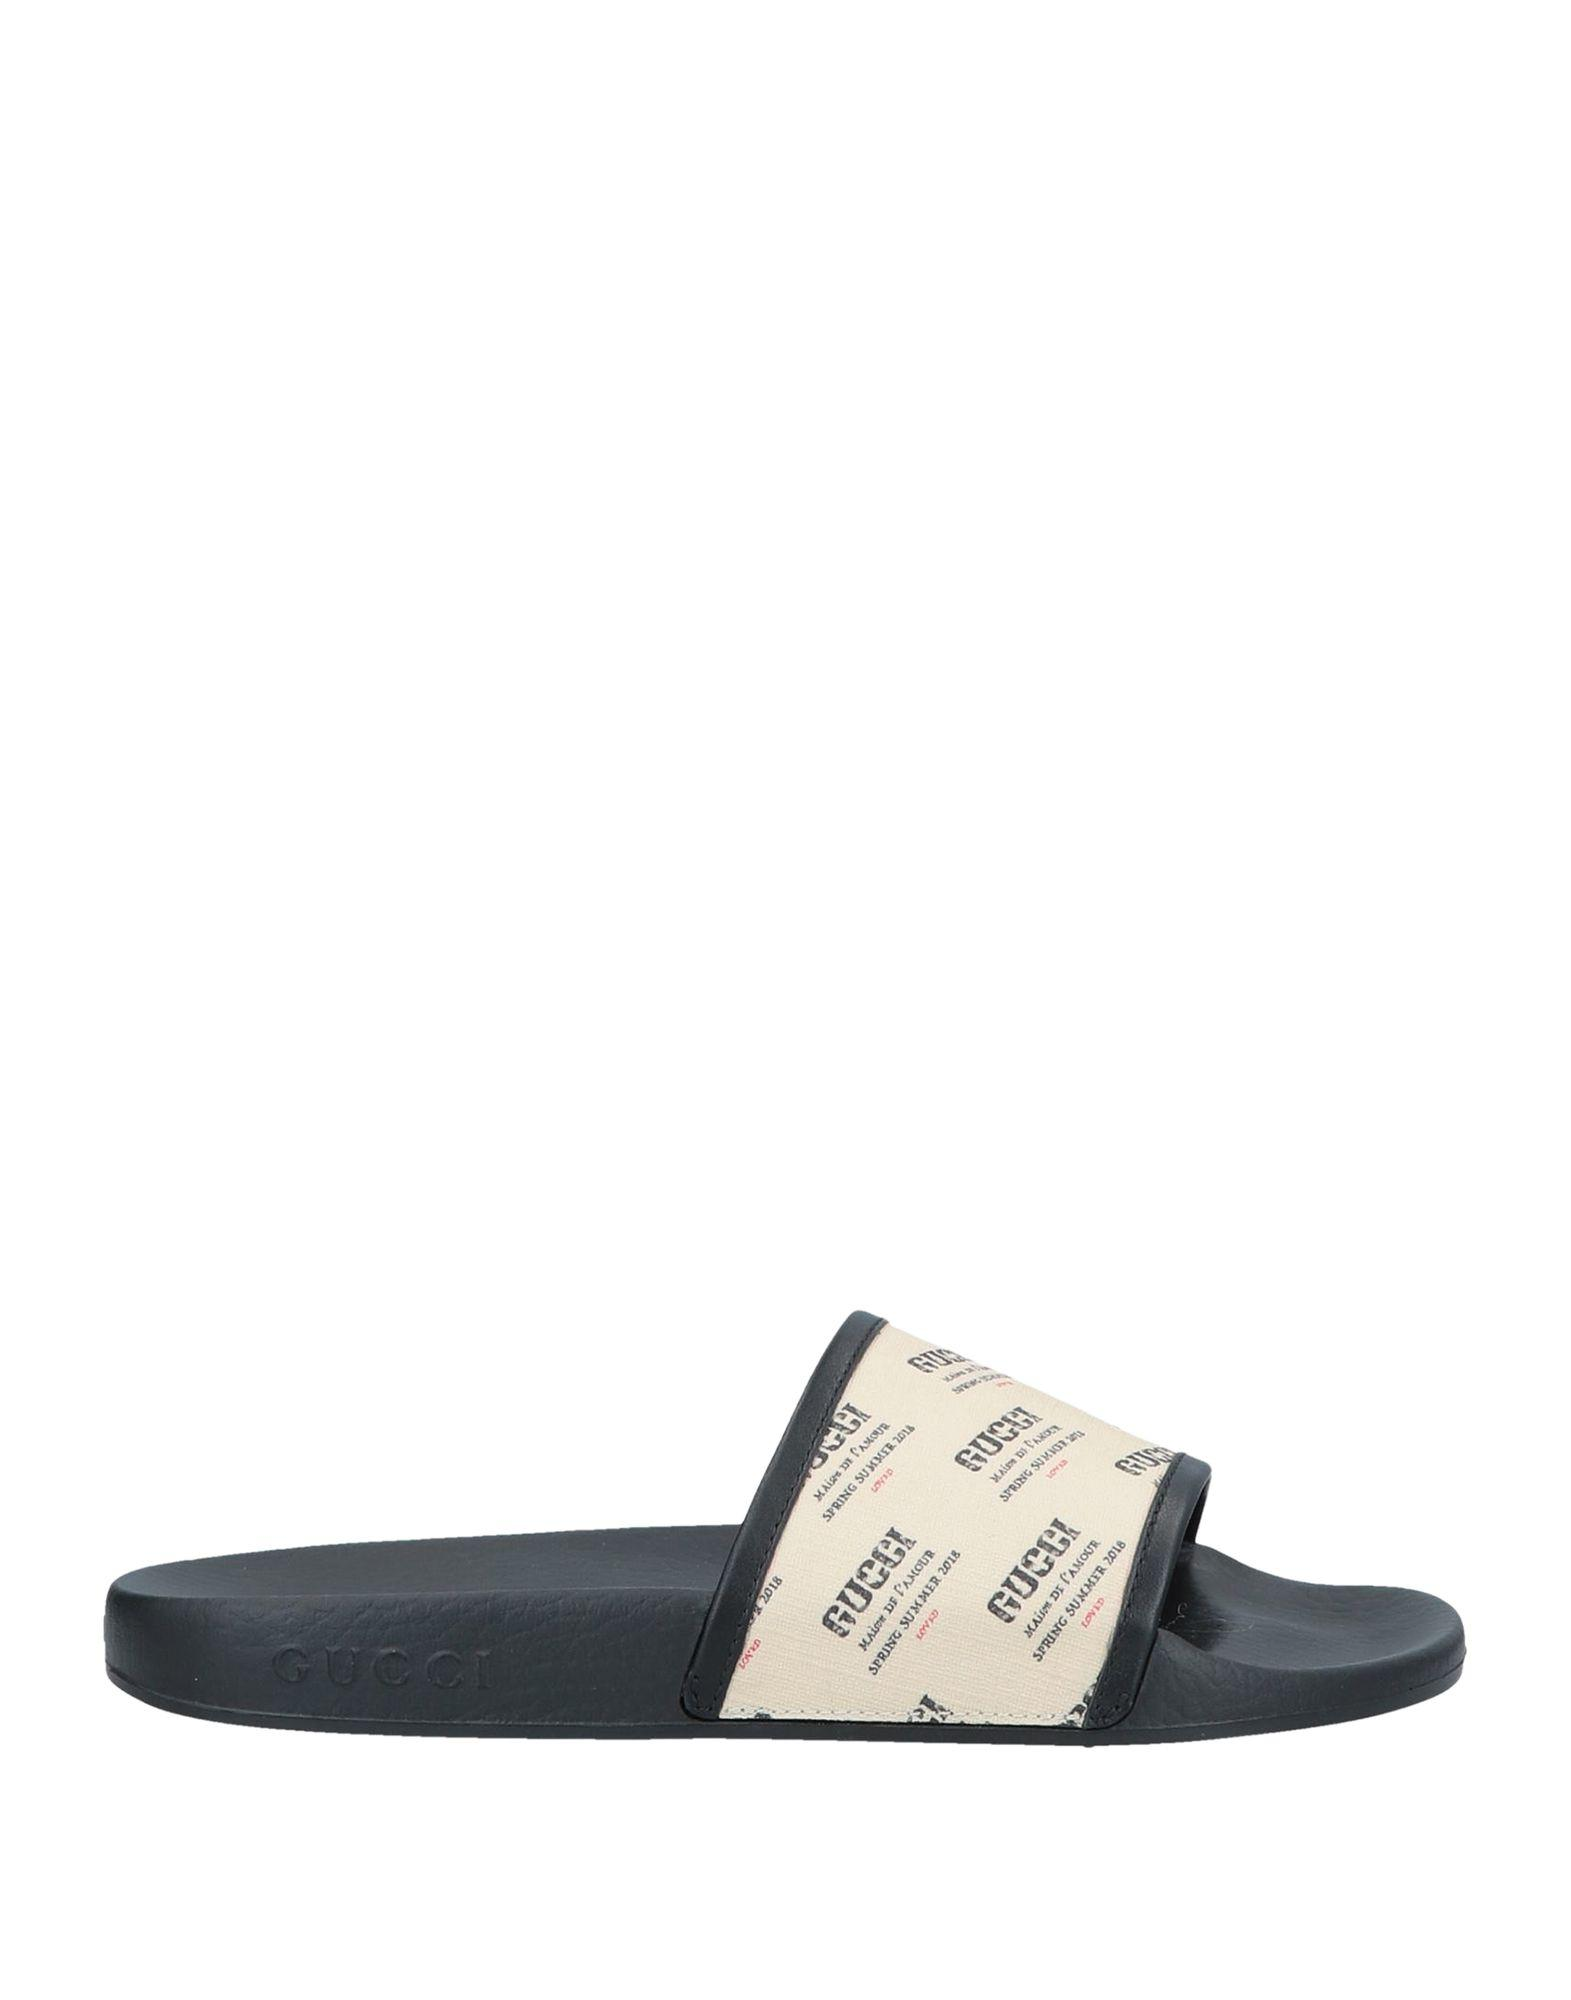 b47e4d0da Gucci - Natural Logo Print Rubber Slide Sandals - Lyst. View fullscreen